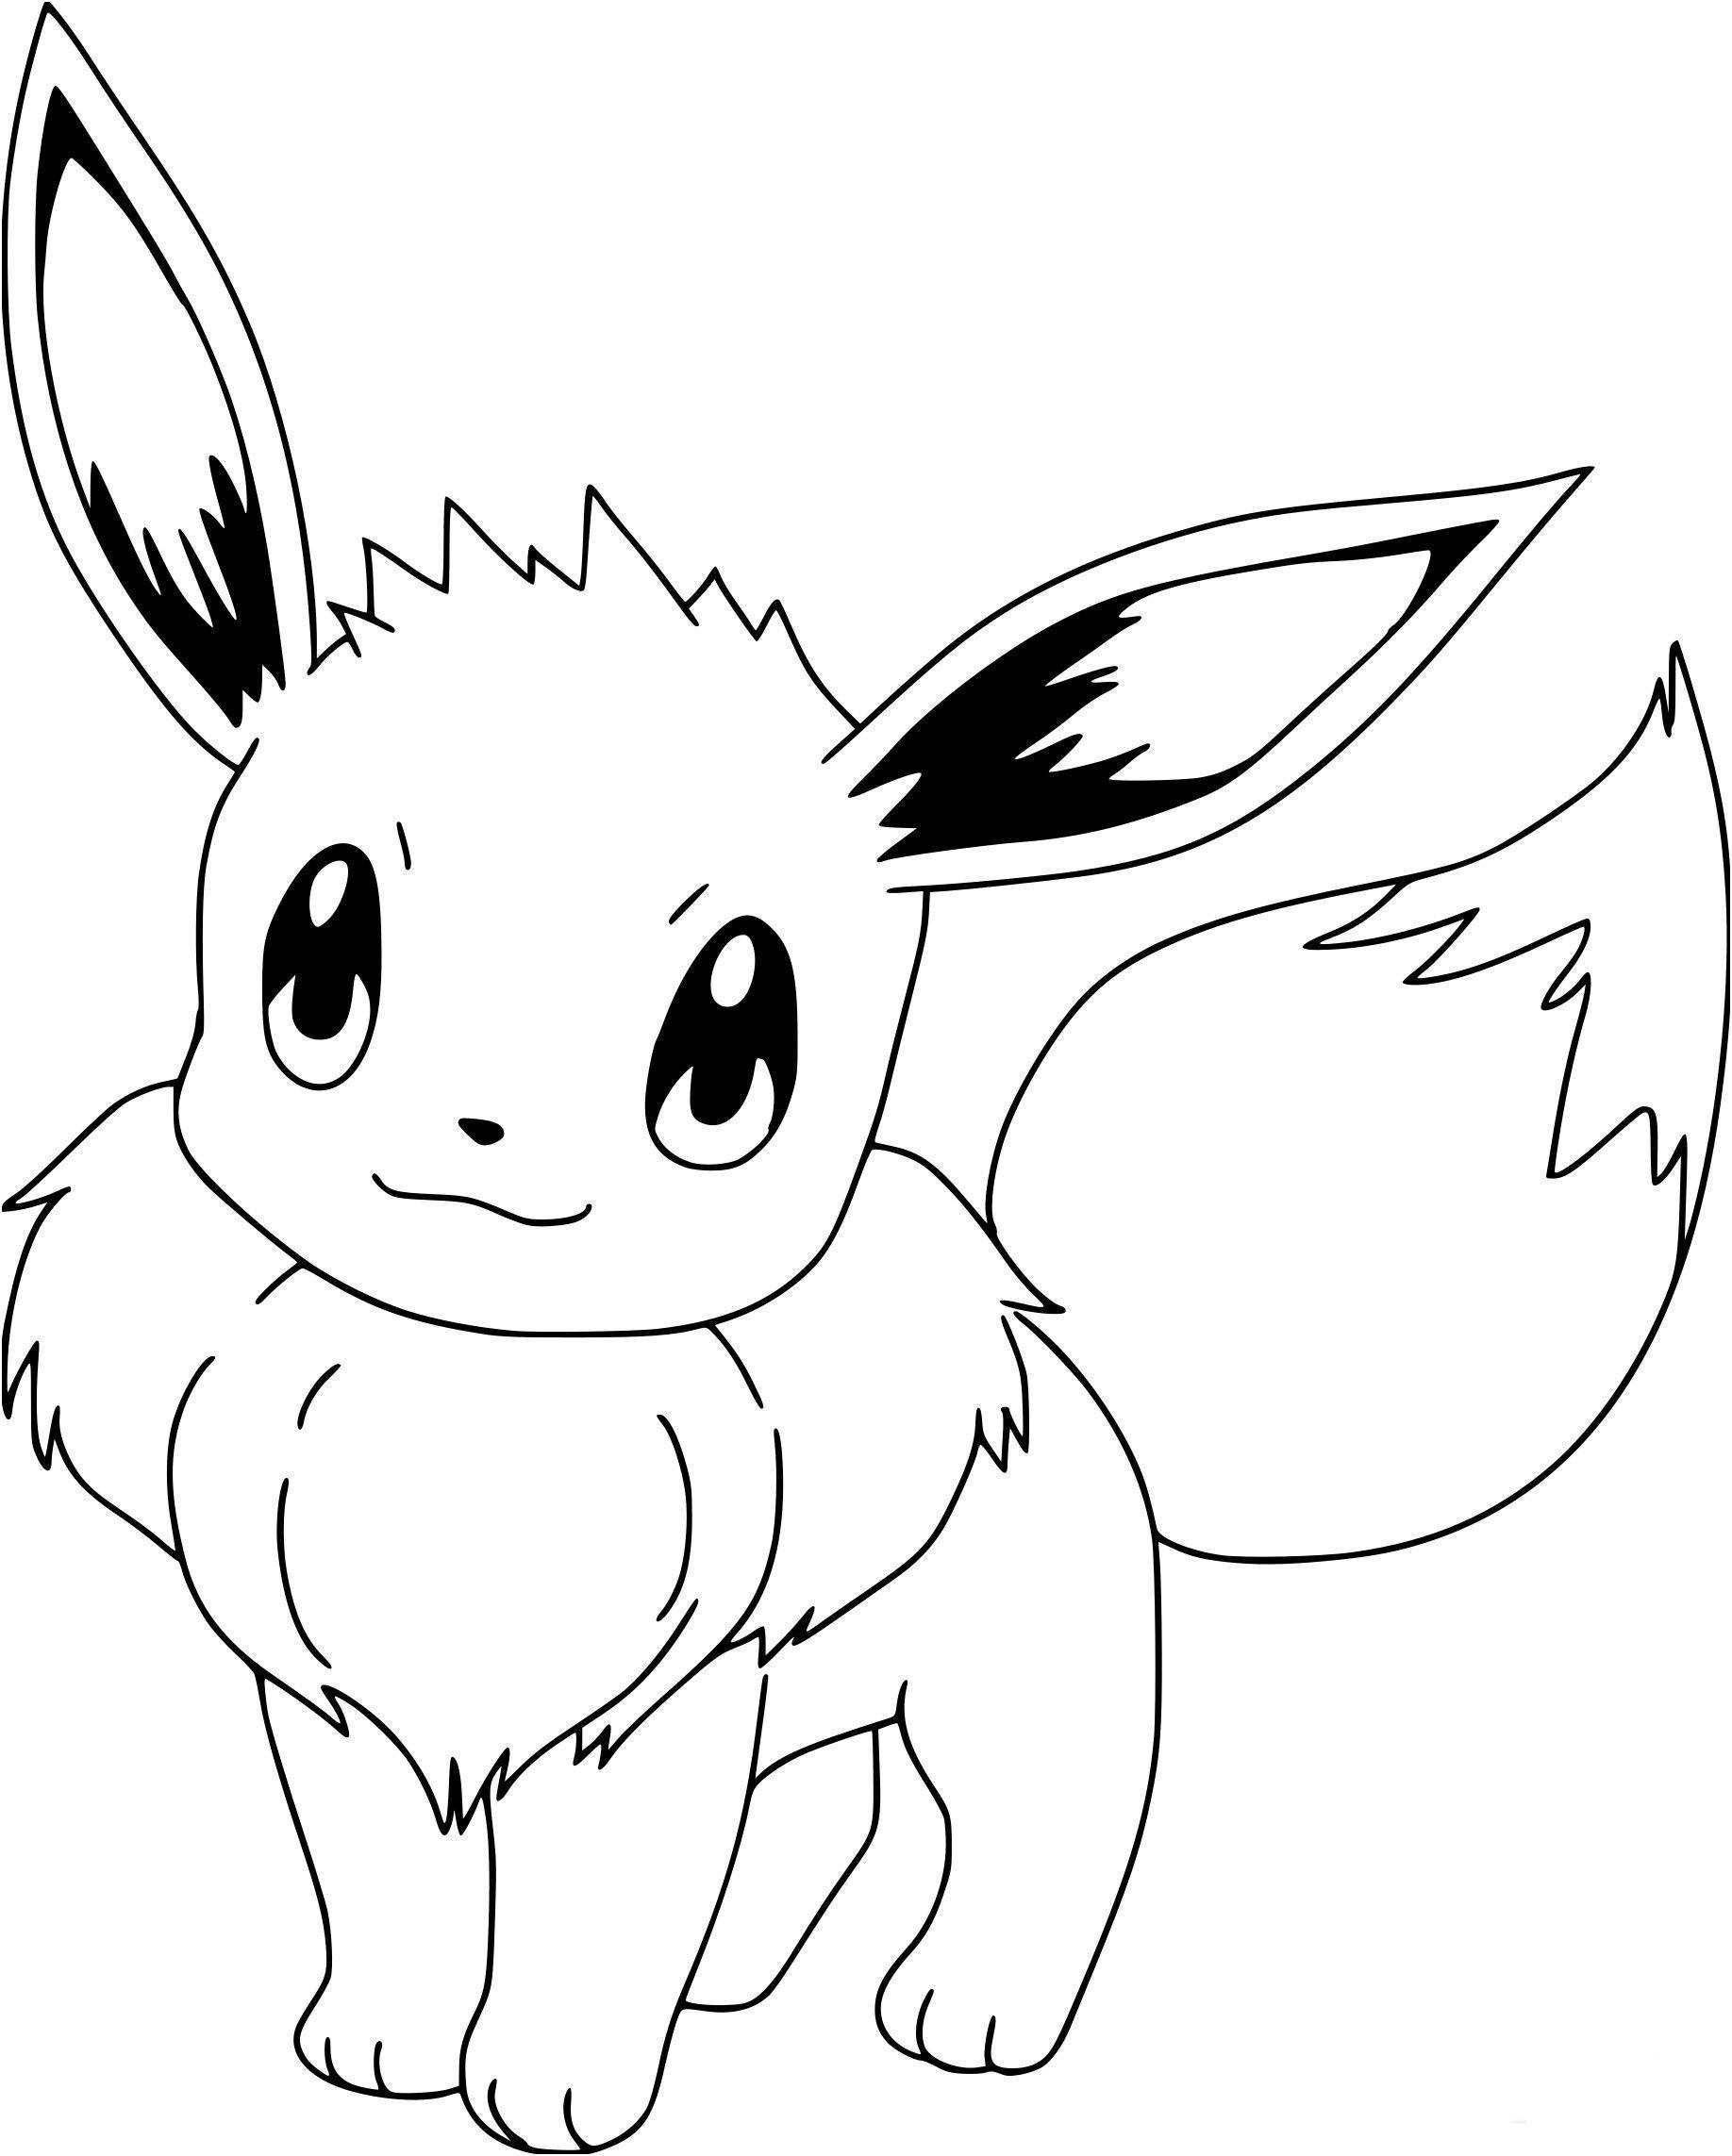 12 Gute Farbung Pokemon Go Stock Pikachu Zeichnung Pokemon Skizze Pokemon Ausmalbilder